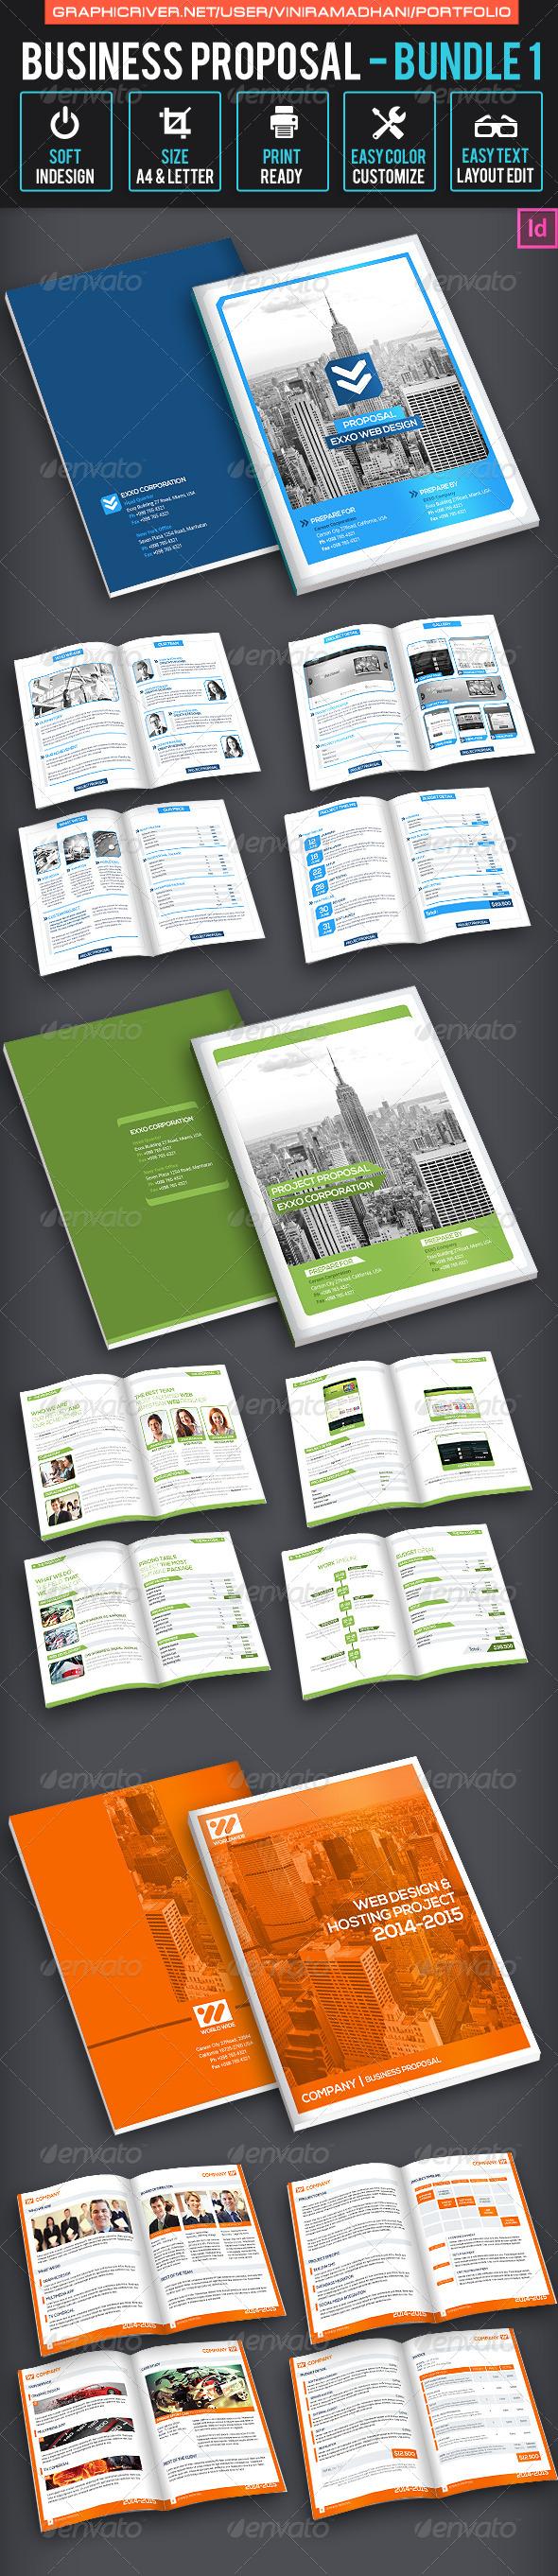 GraphicRiver Business Proposal Bundle 1 7325431